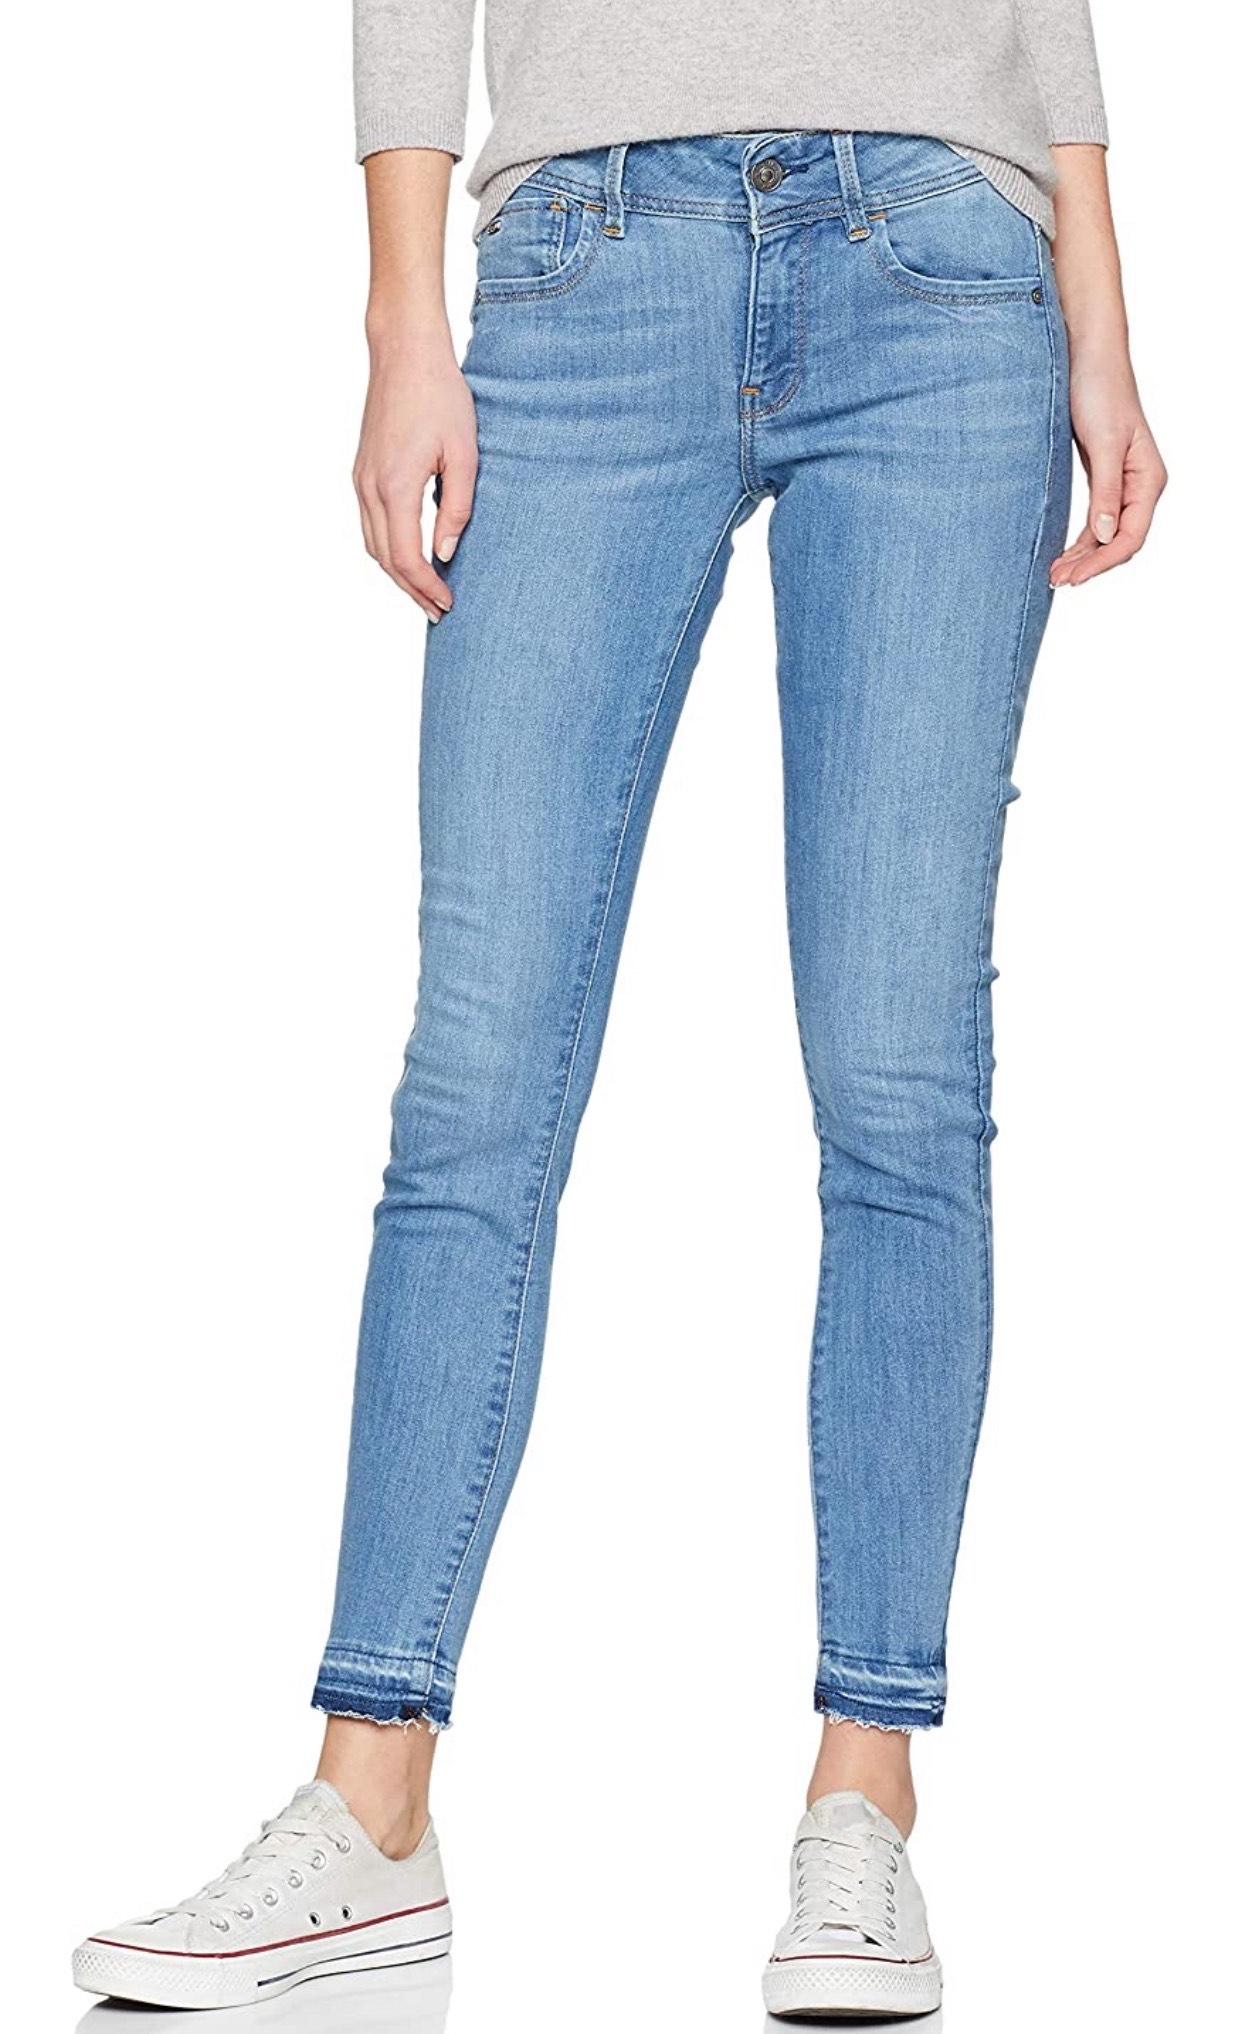 G-STAR RAW Dames Jeans Lynn Mid Taille Skinny Geribbelde Ankle